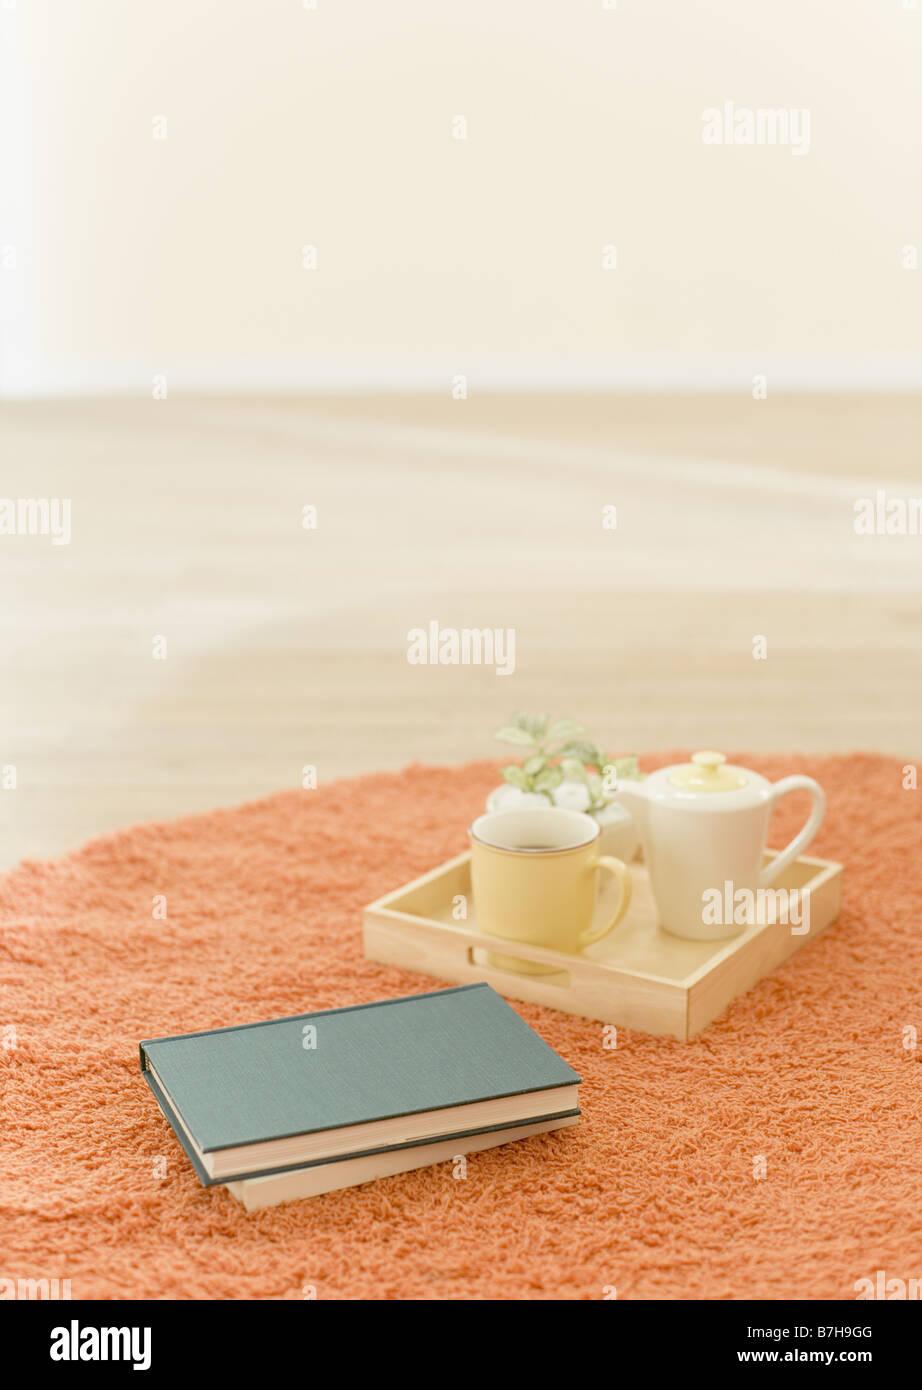 Tea utensil and books - Stock Image